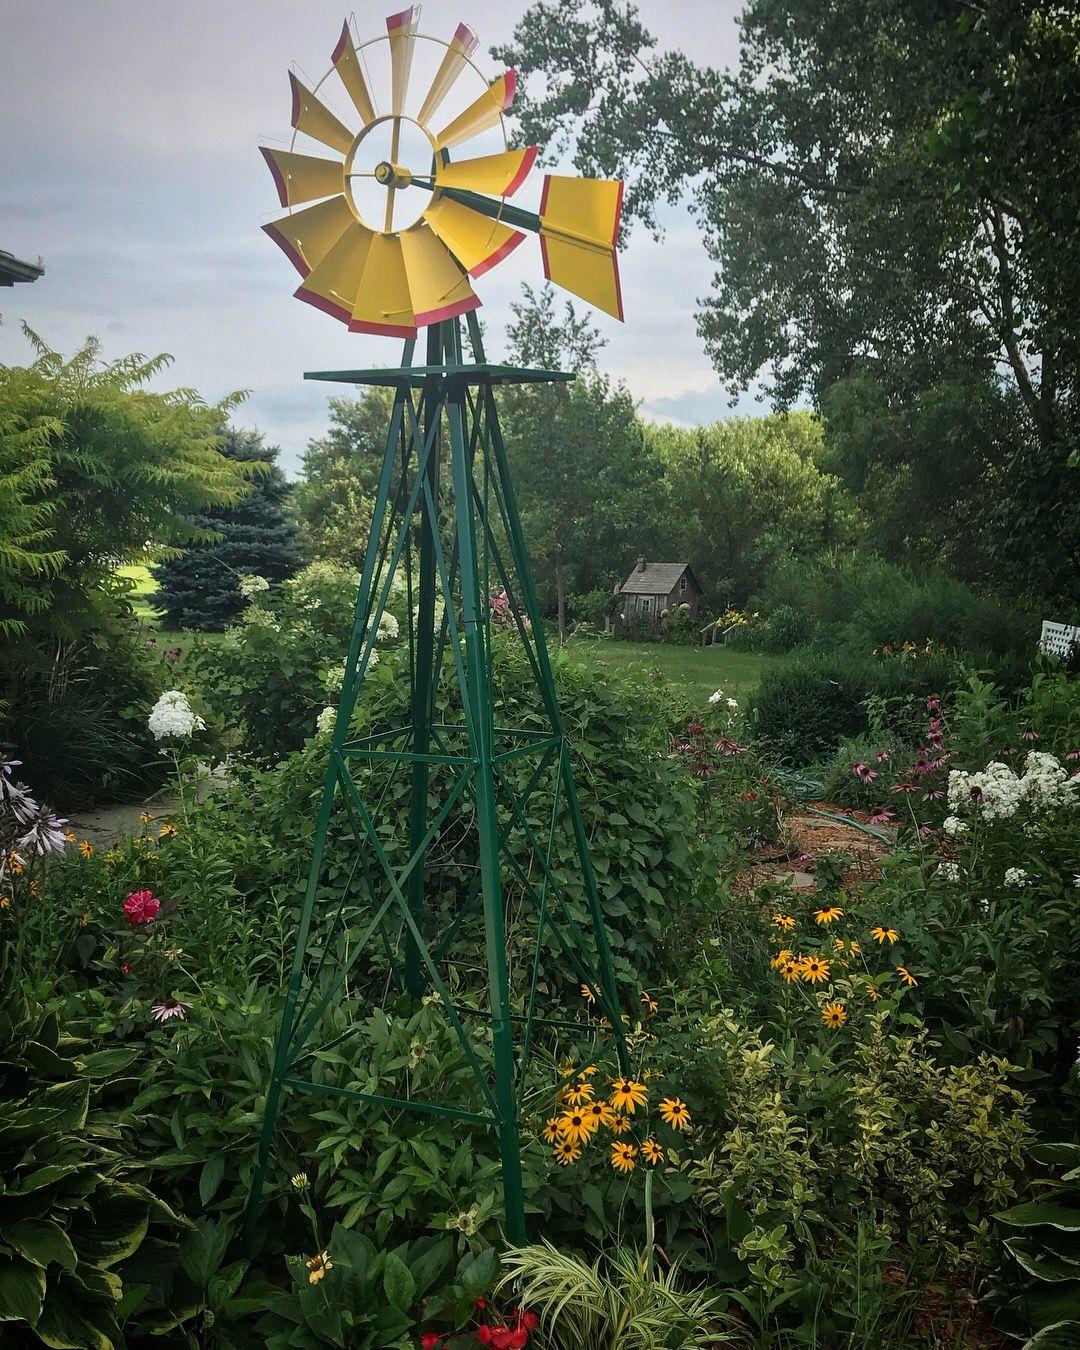 Windmill In My Country Garden Windmill Wind Turbine Garden